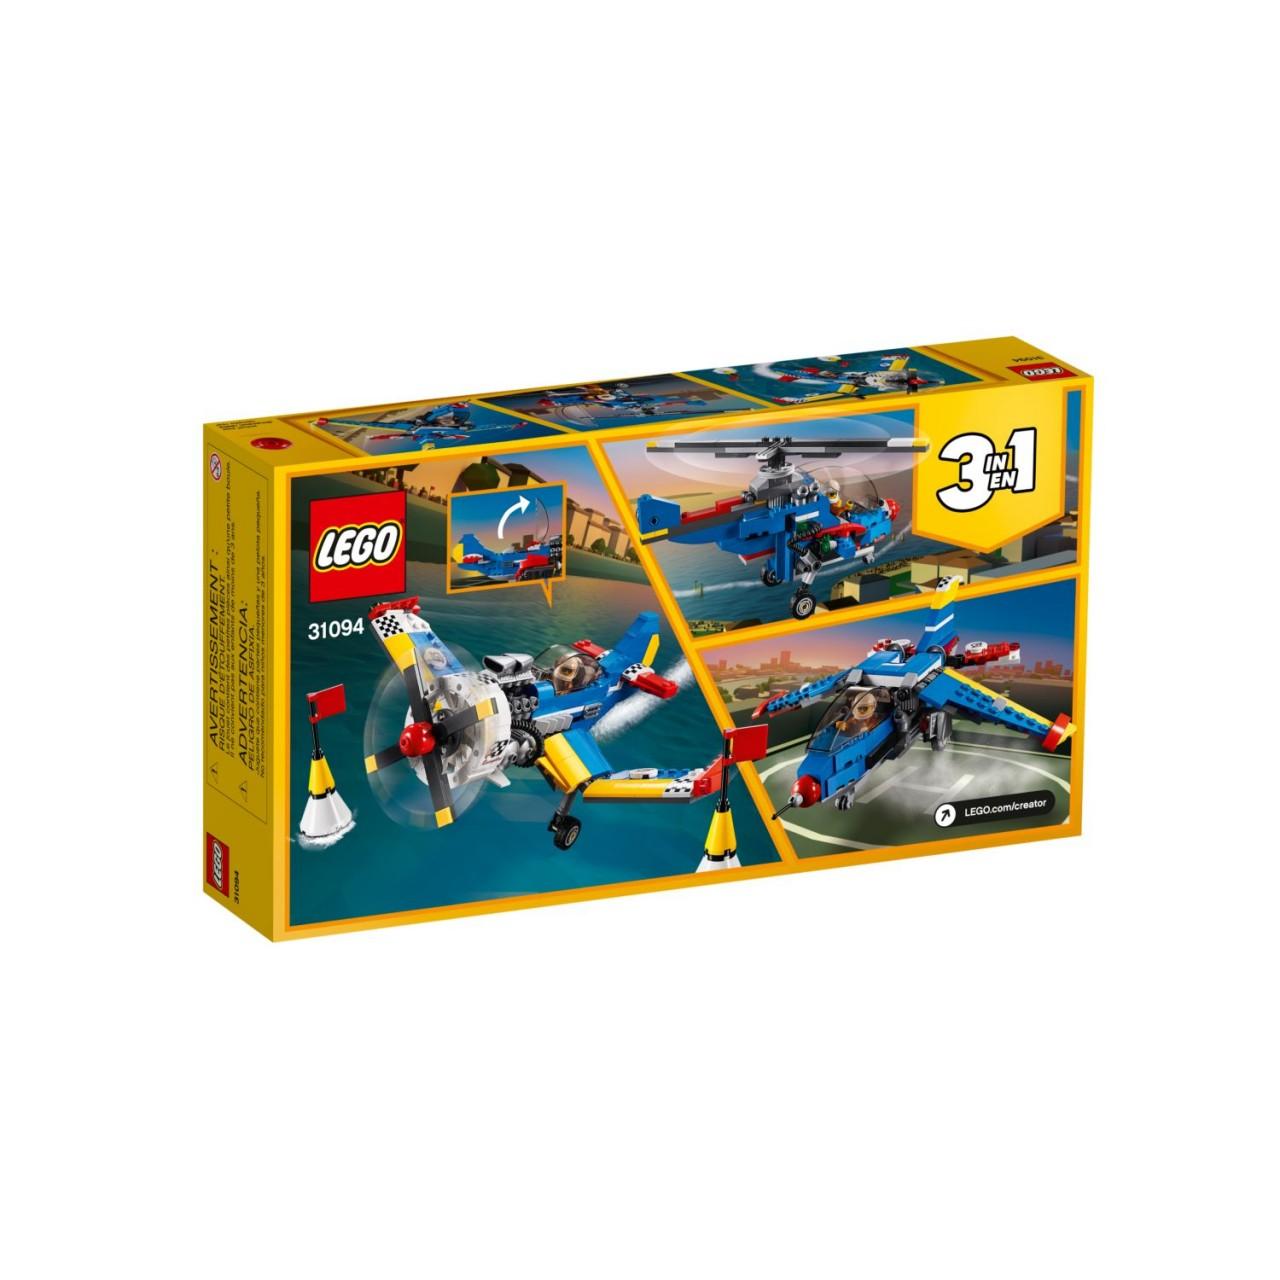 LEGO CREATOR 31094 Rennflugzeug